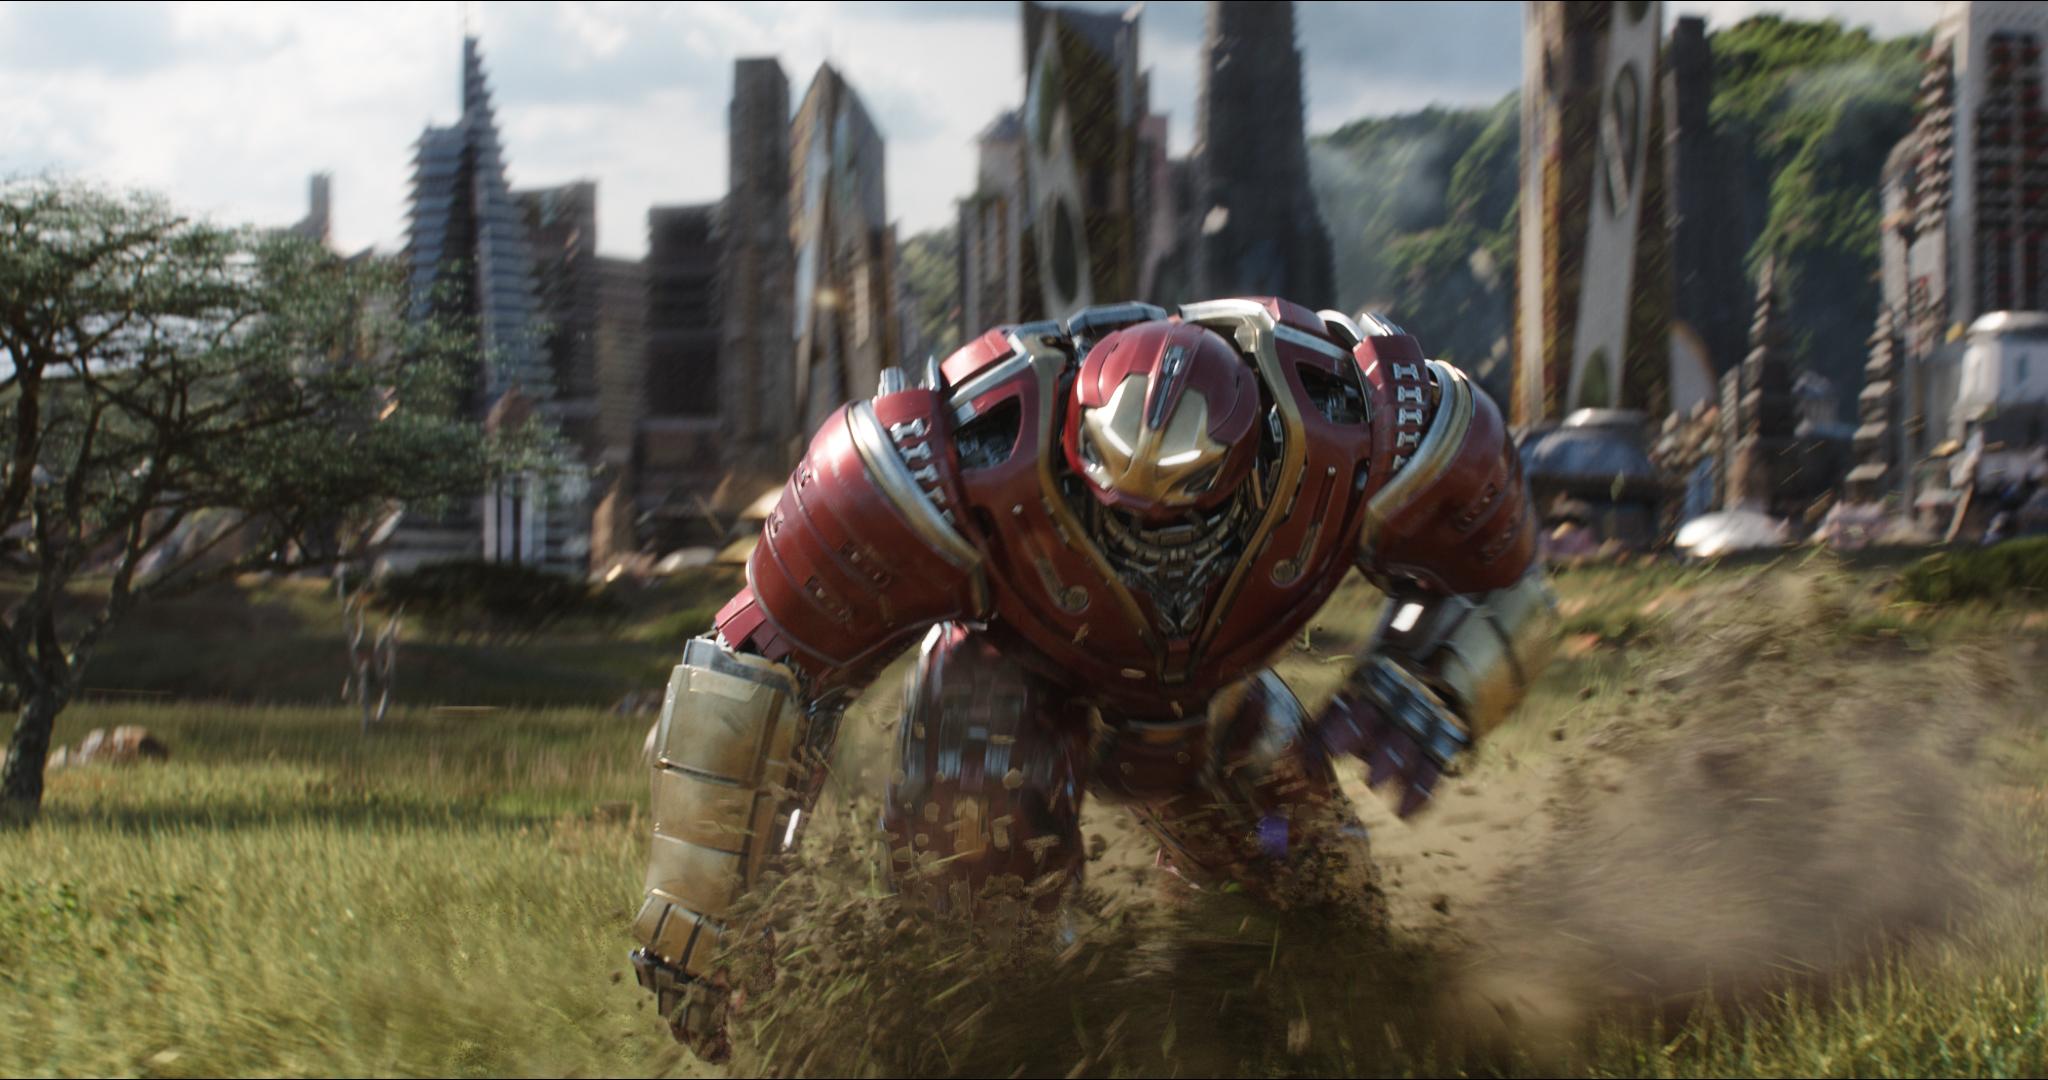 avengers infinity war image big iron man - Avengers: Infinity War - La Reseña Cinergetica (Spoilers) y Análisis